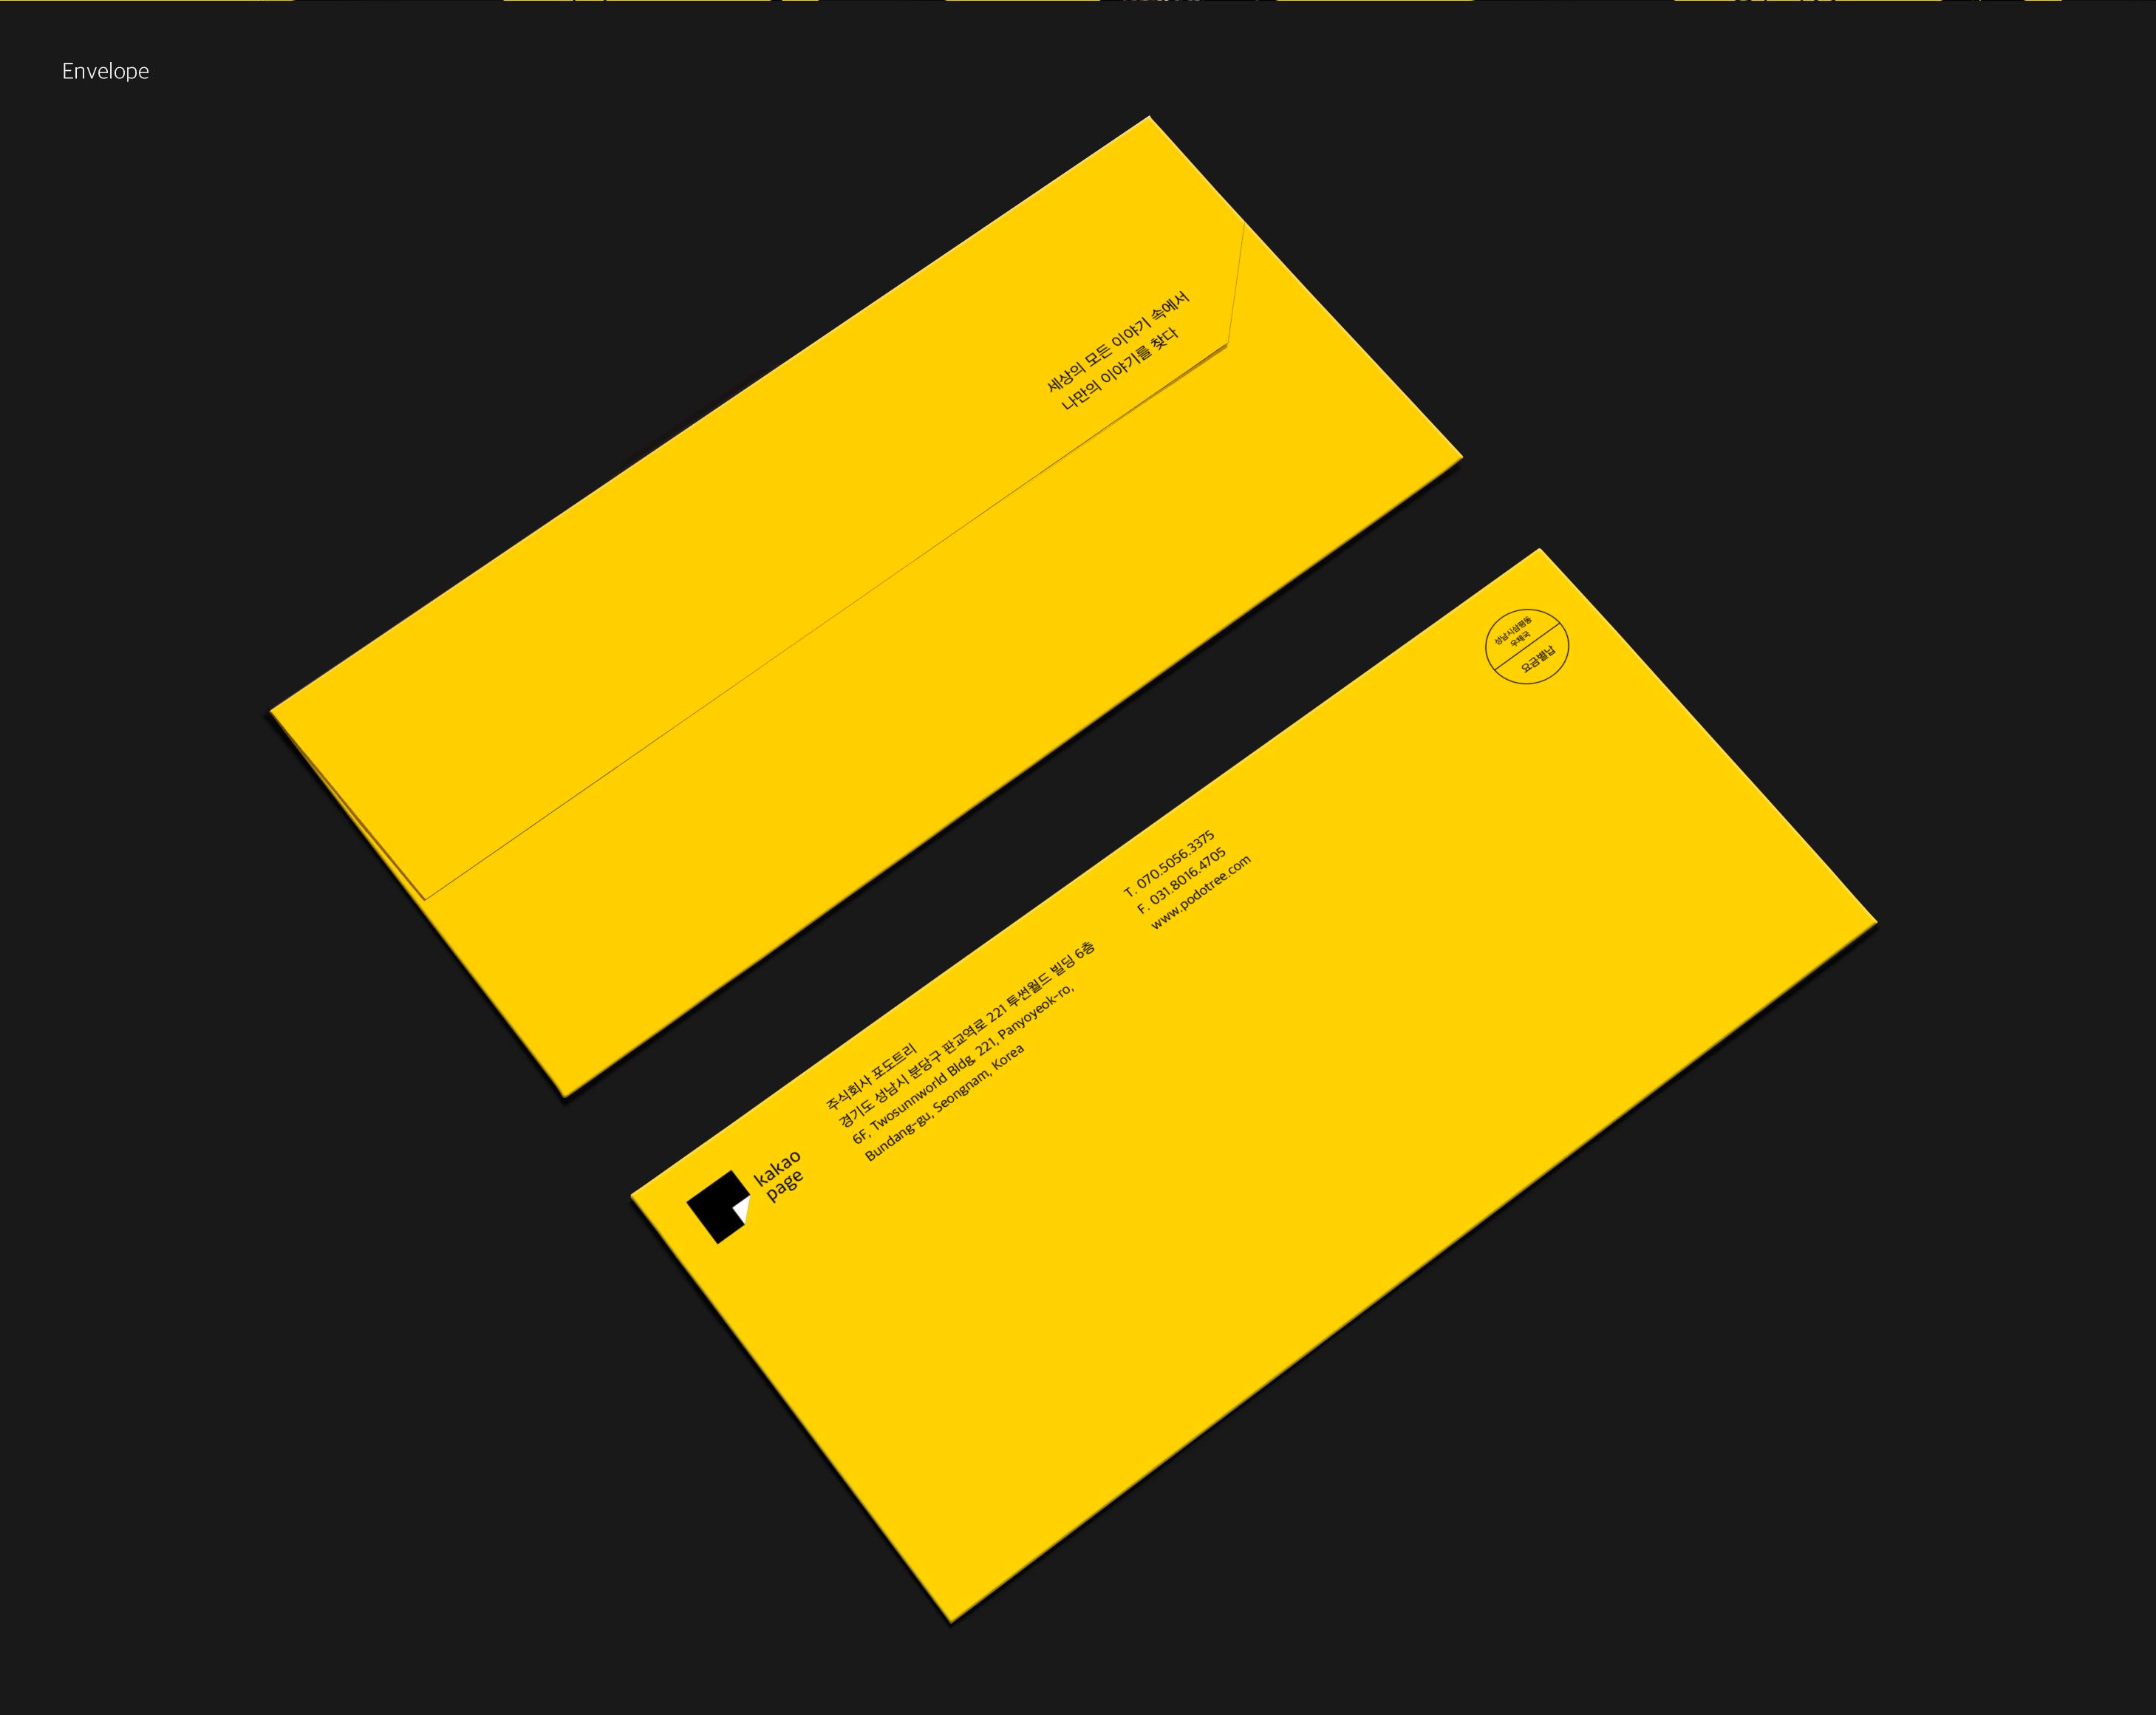 kakaopage-Brand-eXperience-Design-Renewal-34